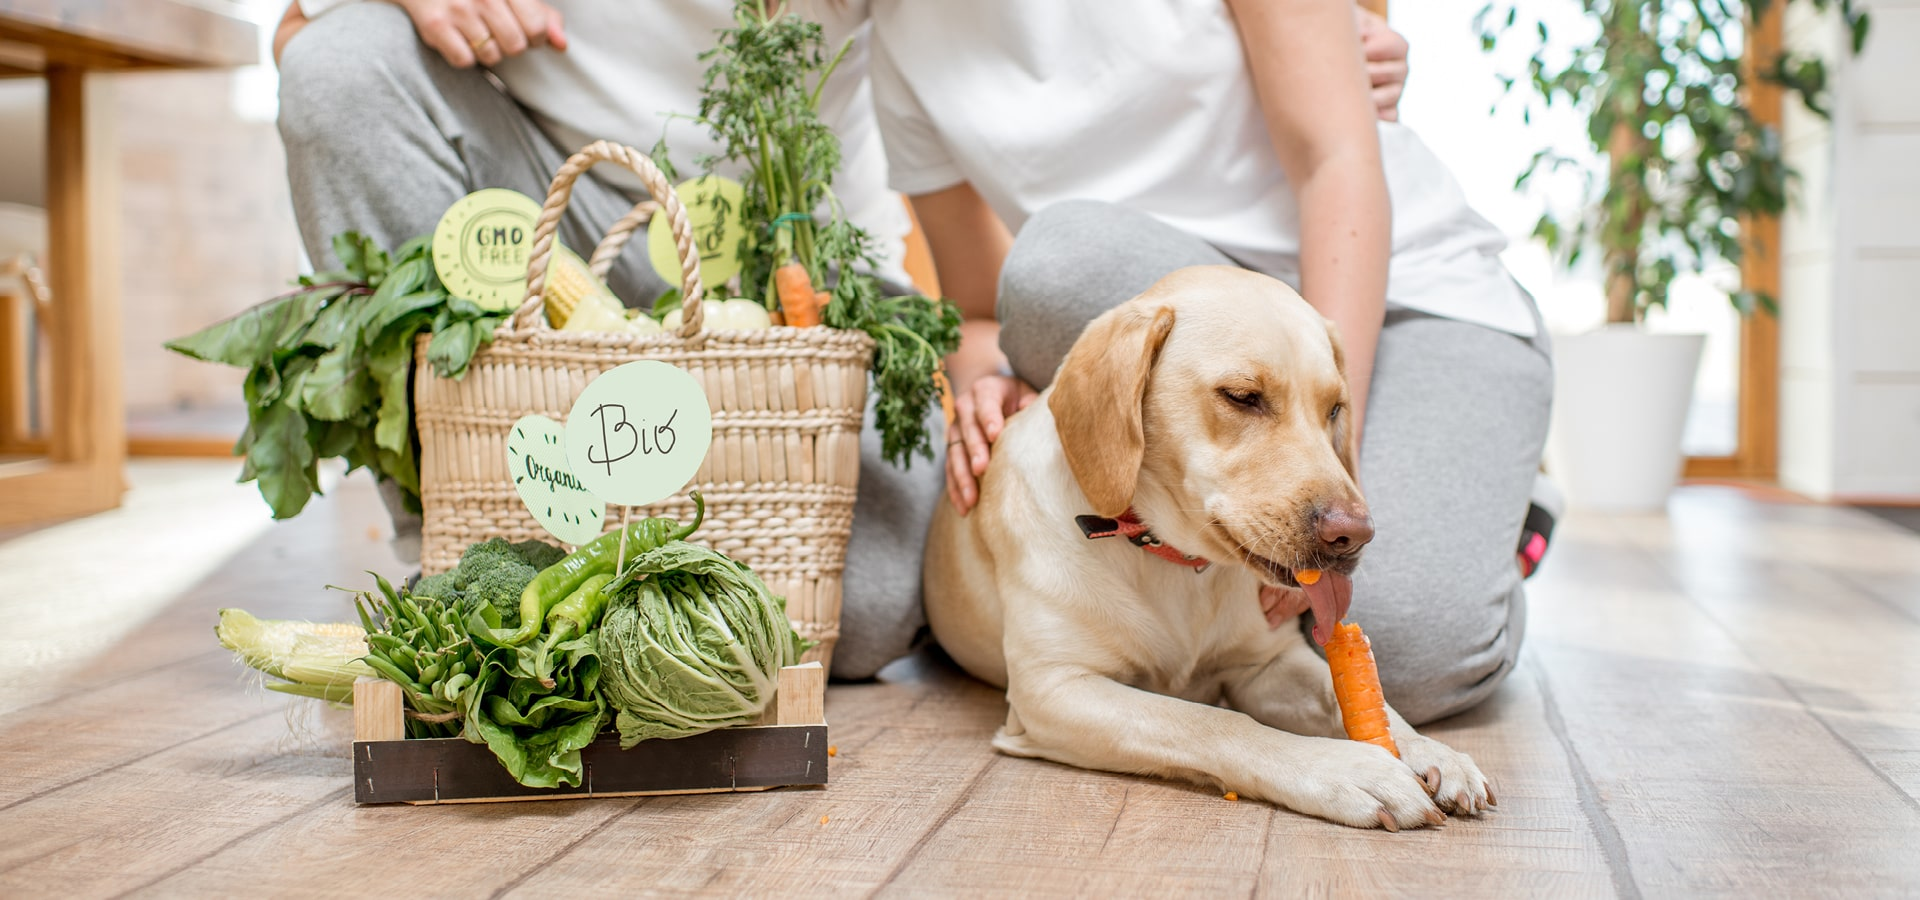 hunde vegetarisch ernähren